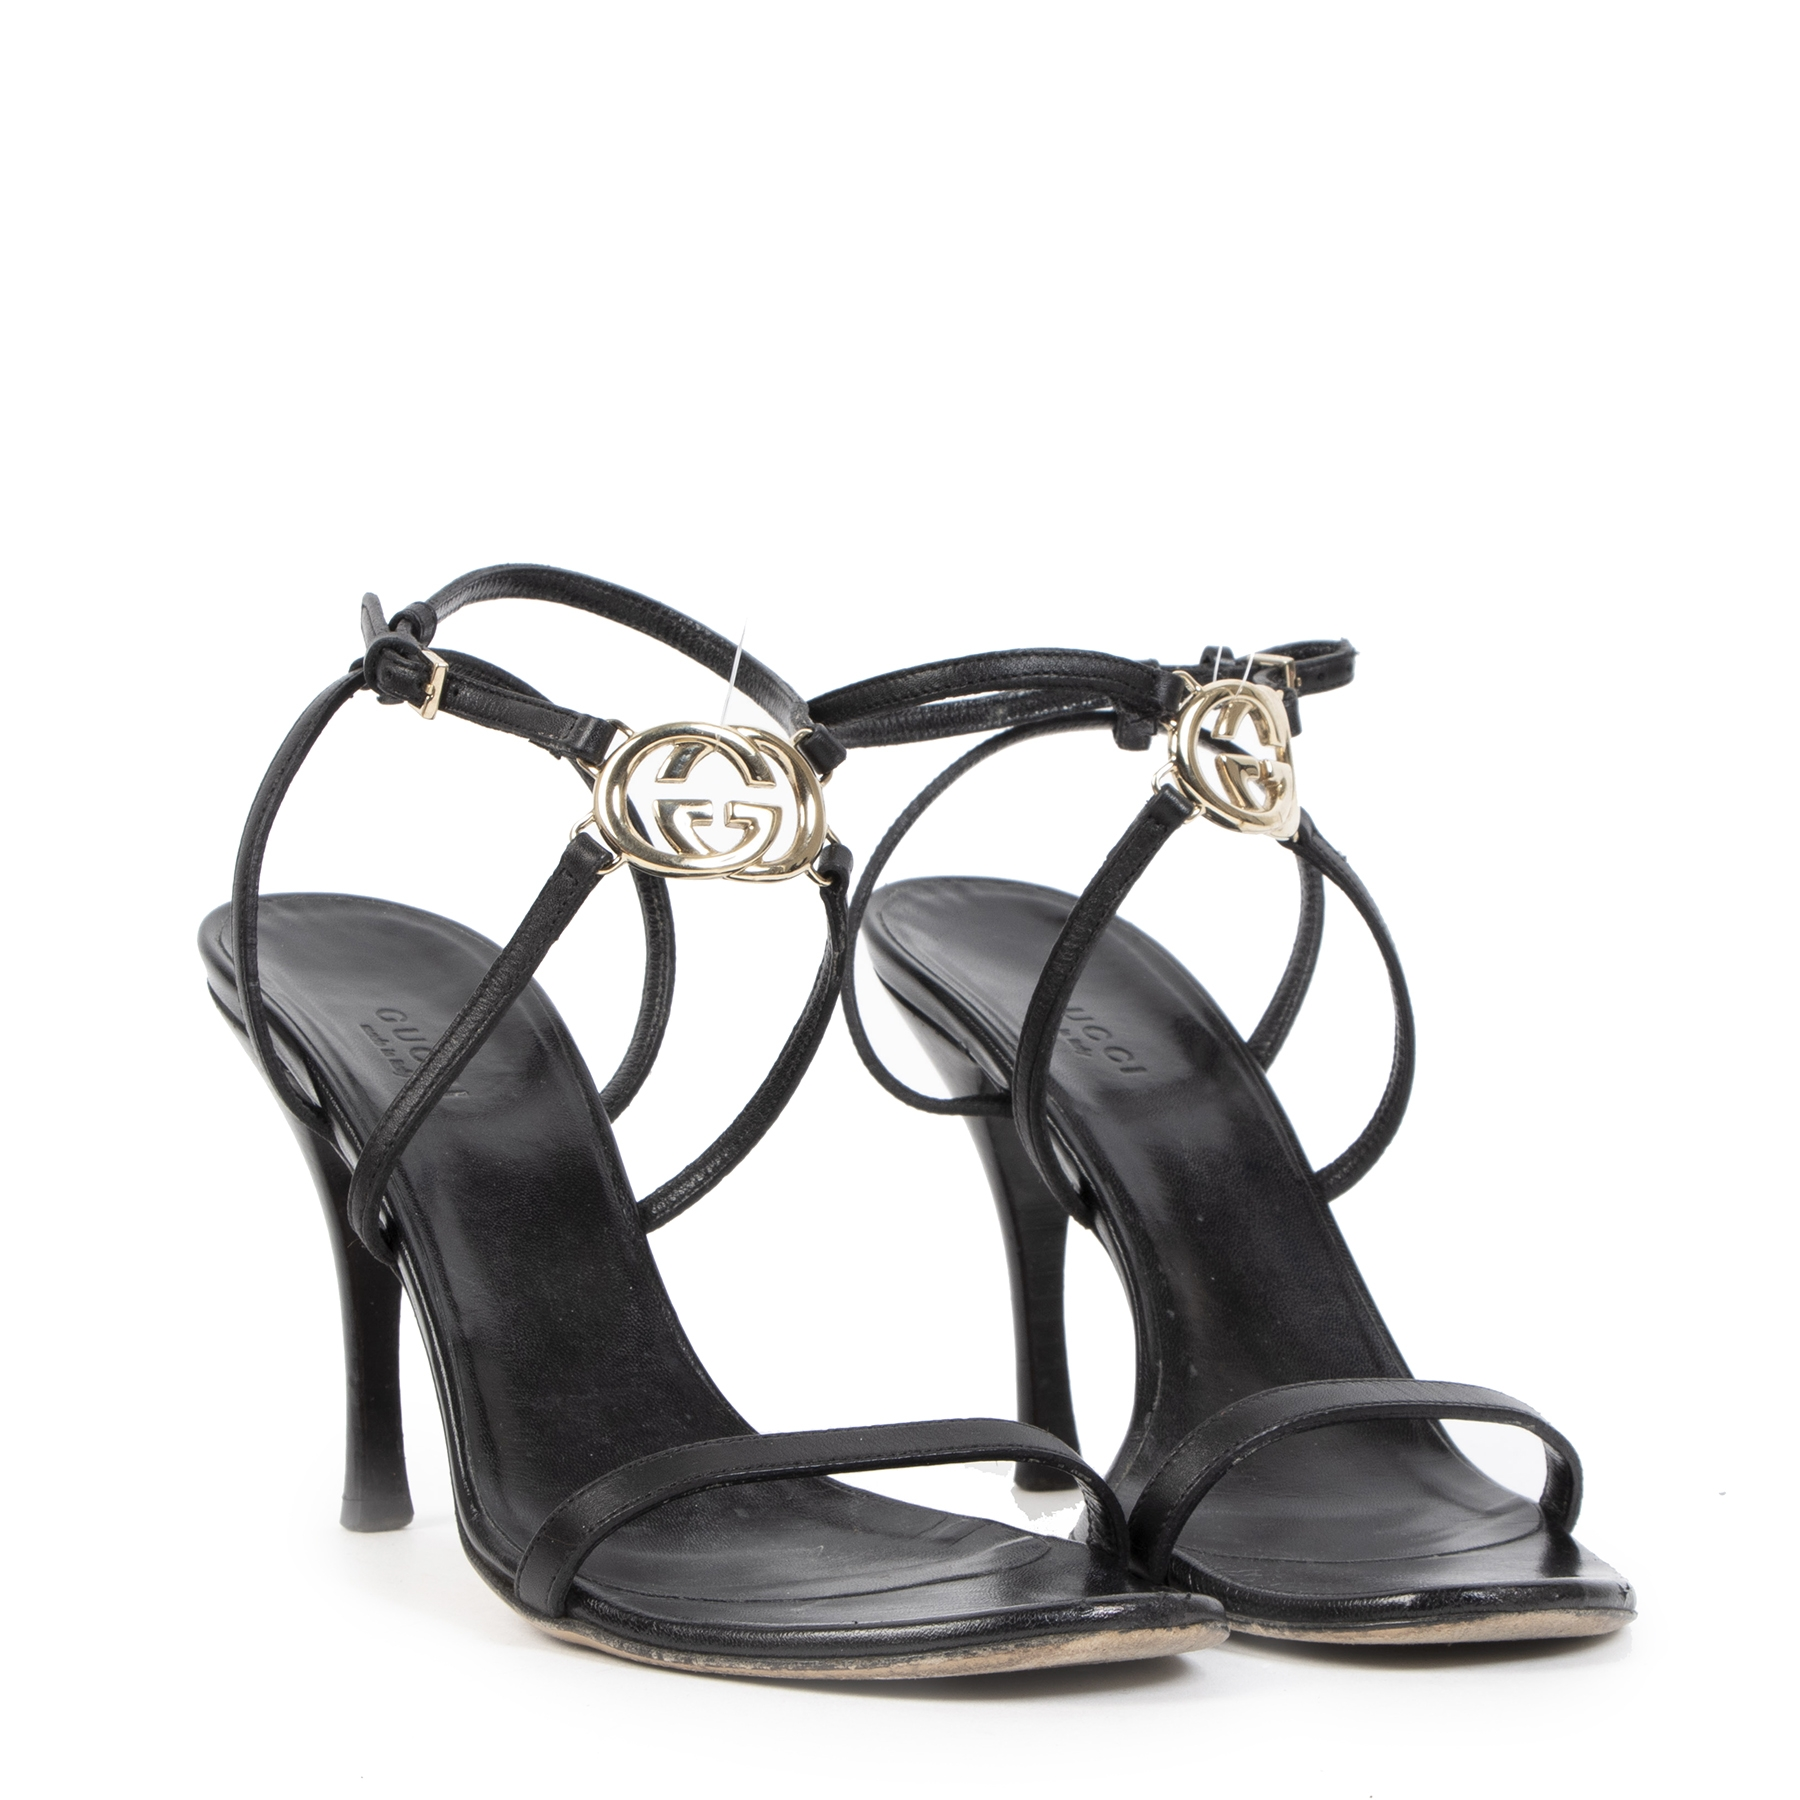 Authentieke tweedehands vintage Gucci Strappy Sandal Heels - Size 39 koop online webshop LabelLOV